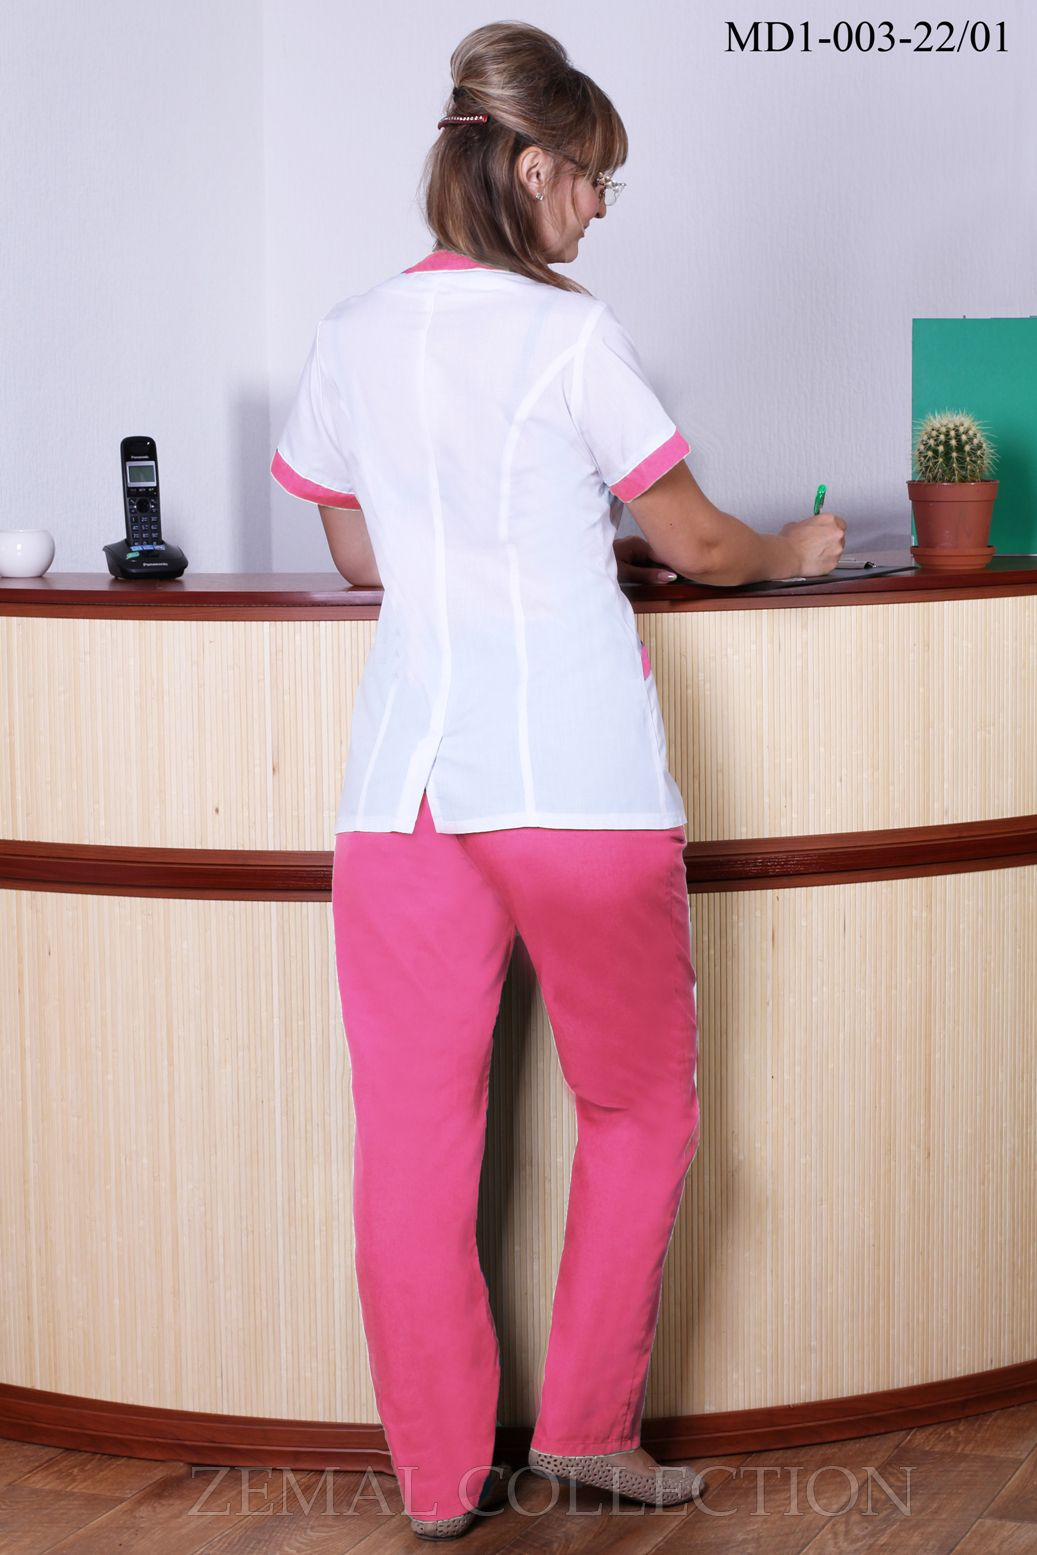 Мед. костюм MD1-003 купить на сайте производителя